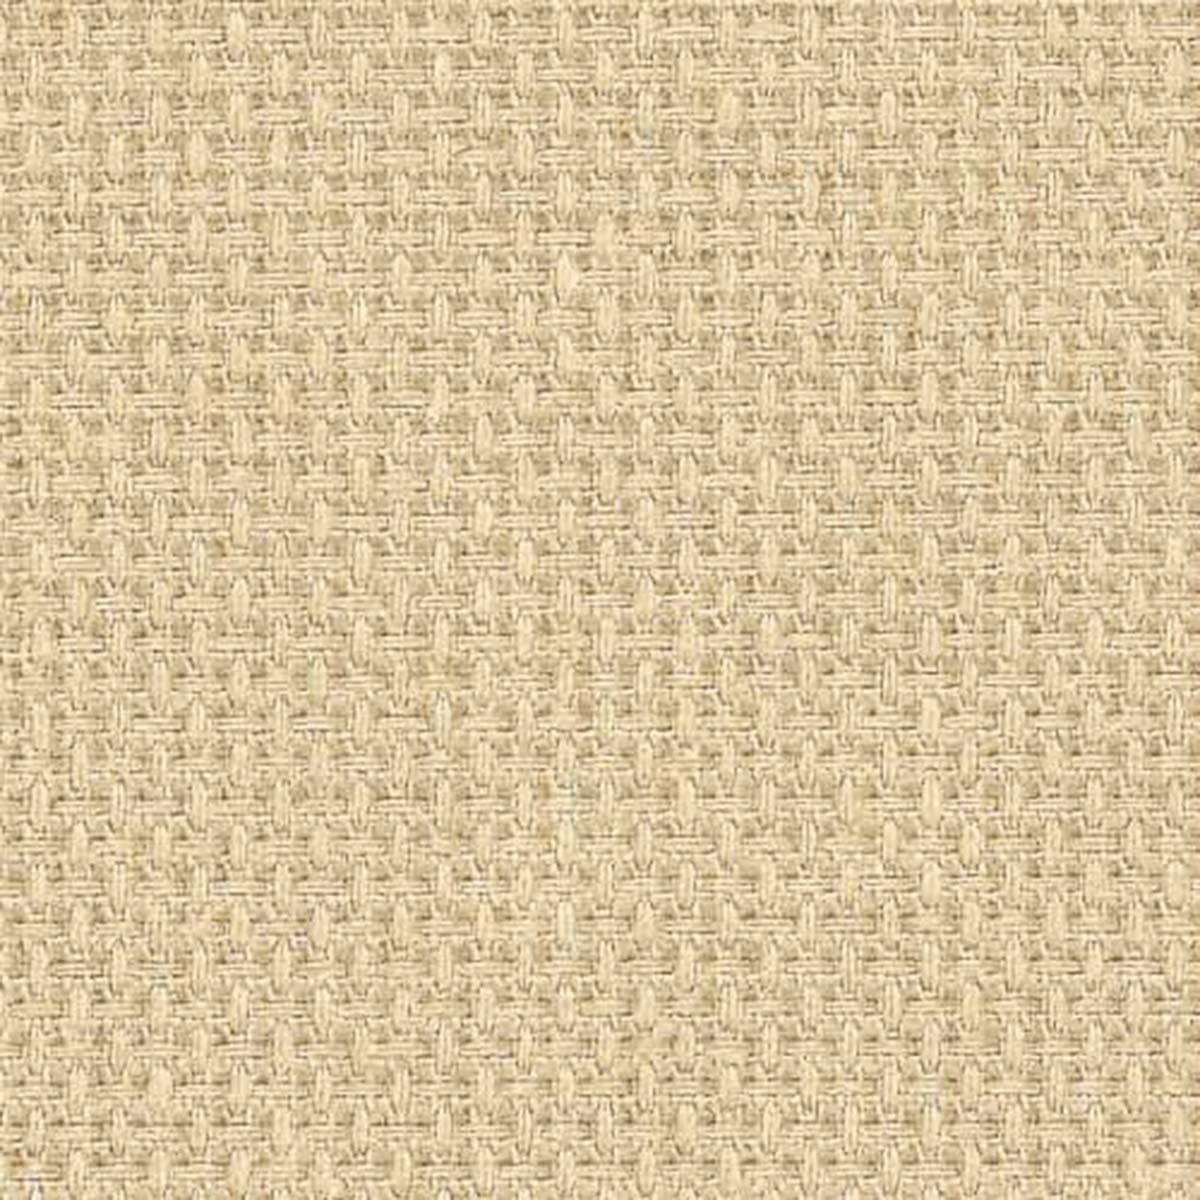 "Zweigart 18-Ct. Aida Cloth - 18 x 21"" Needlework Fabric"